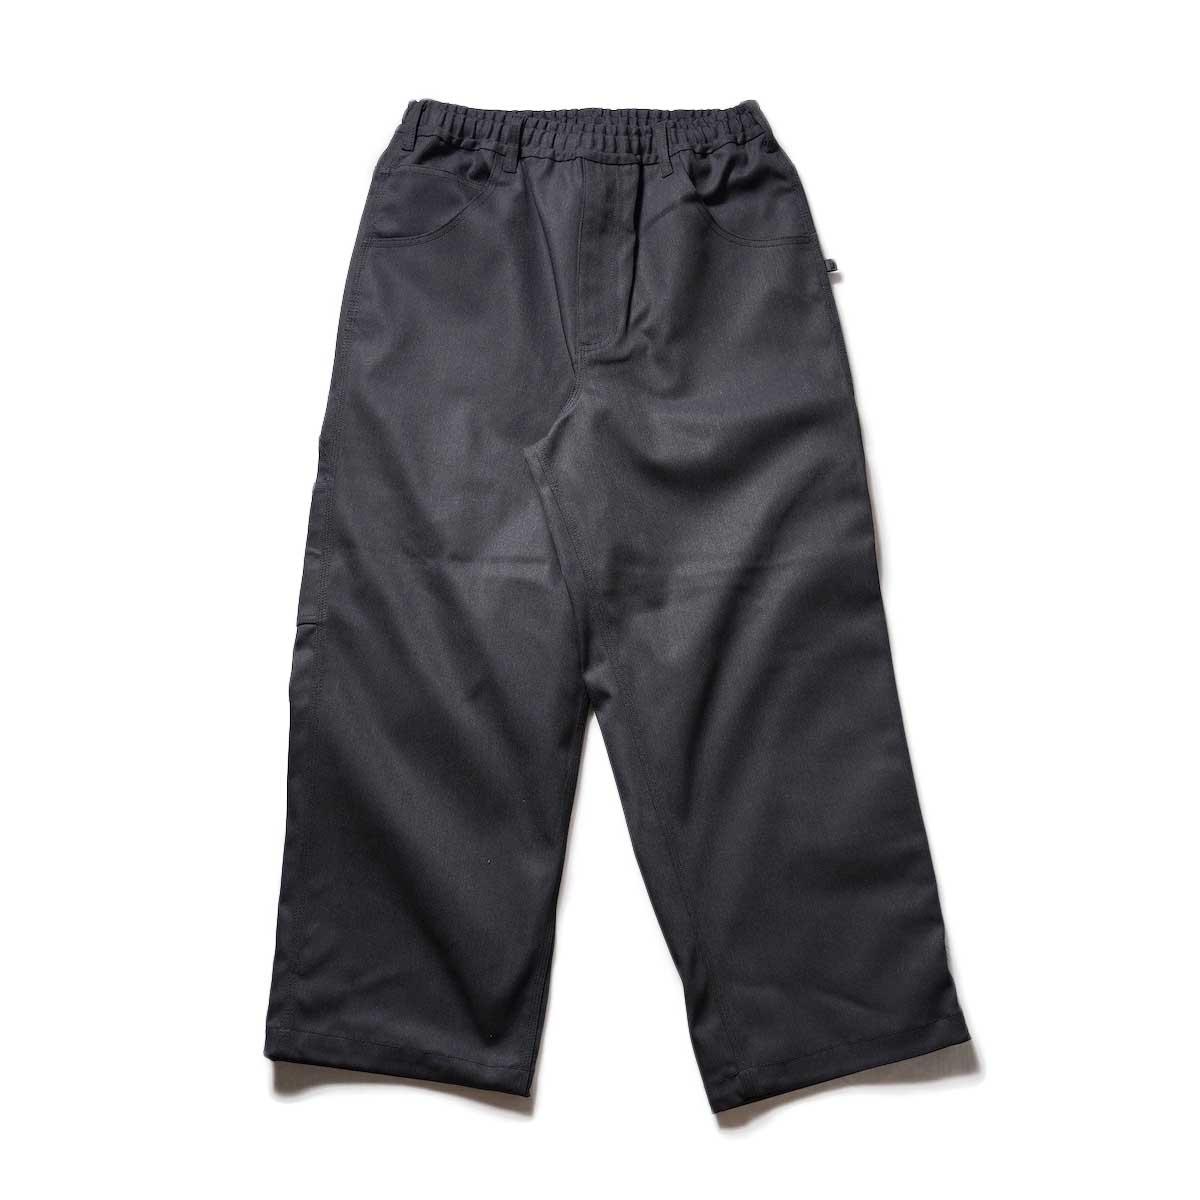 DAIWA PIER39 / TECH DEIM WORKERS PANTS (Black)